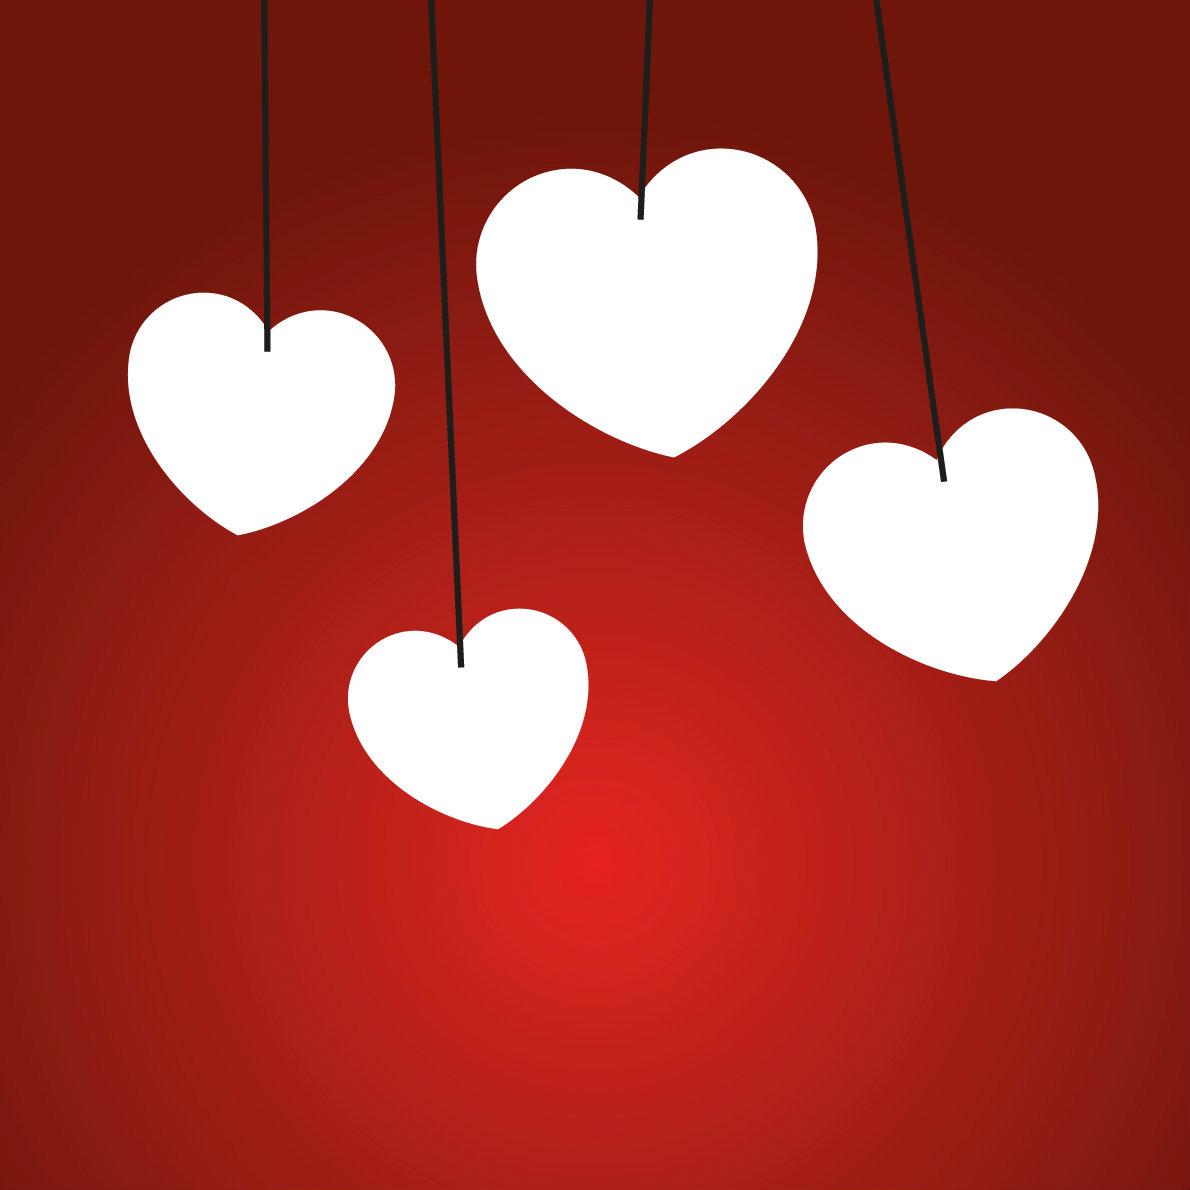 Happy Valentine's Day! Love, Keeper